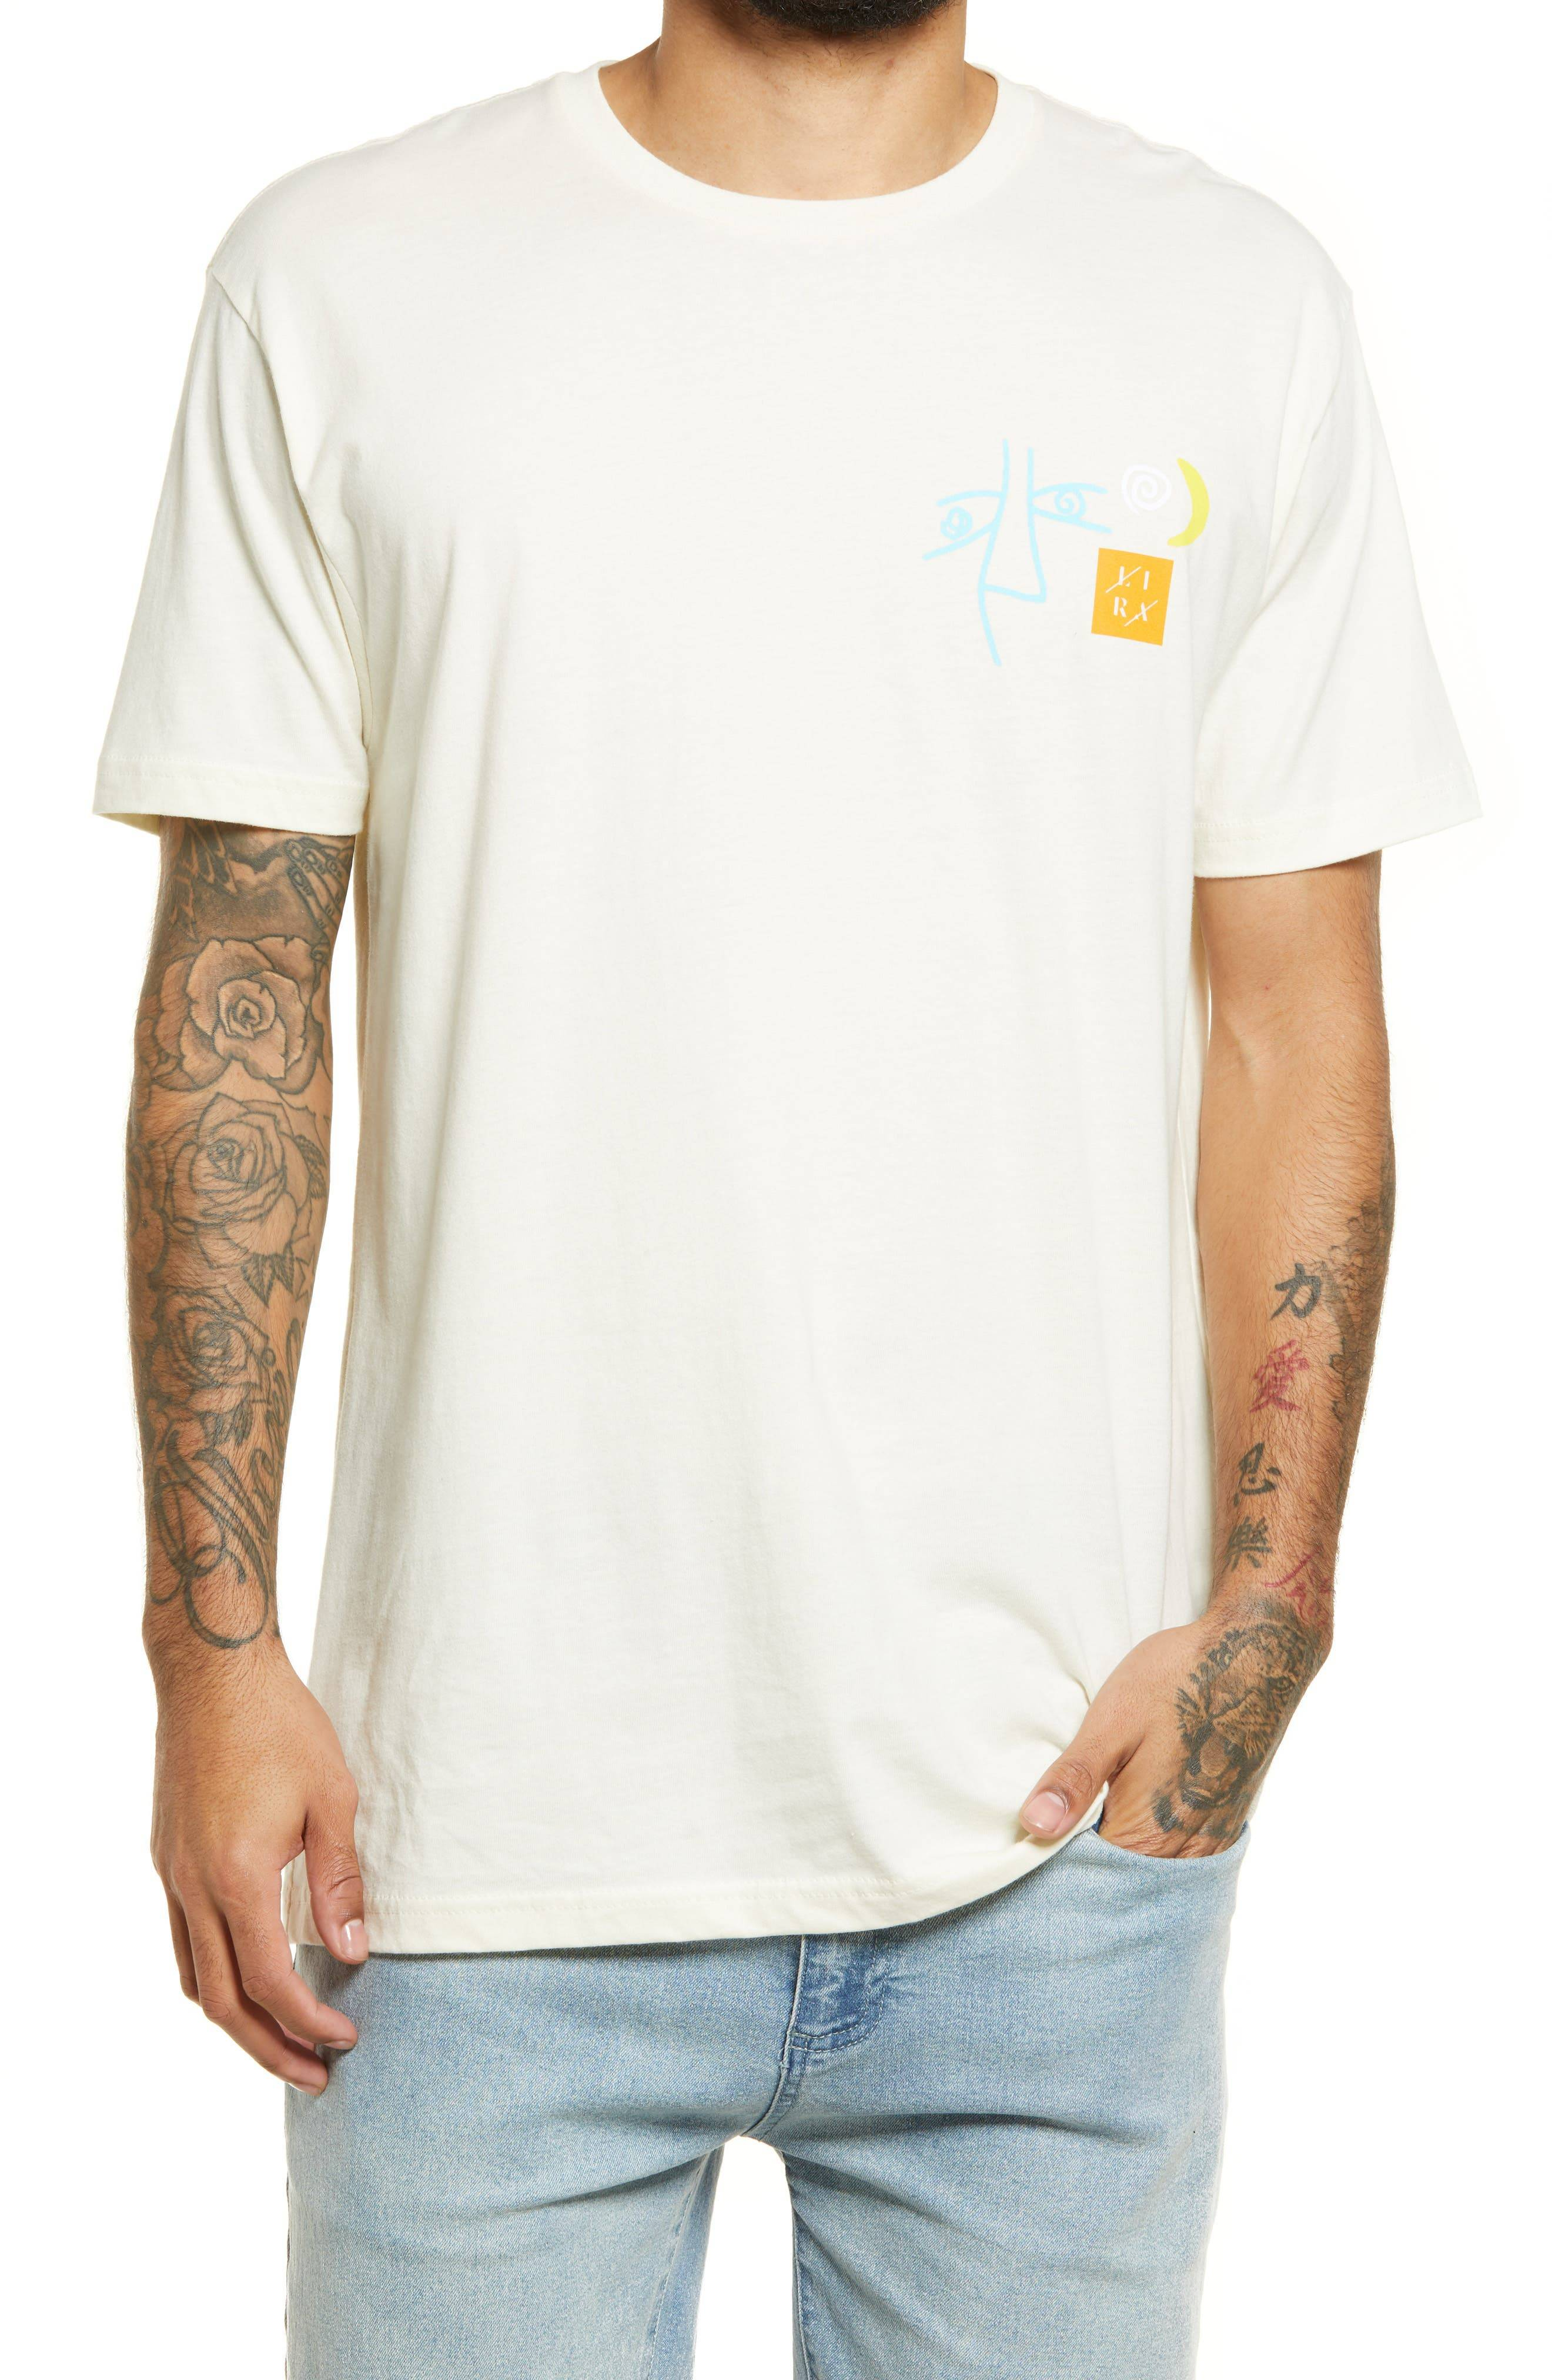 Lira Clothing Men's Lira Clothing Rantour Men's Graphic Tee, Size Medium - White